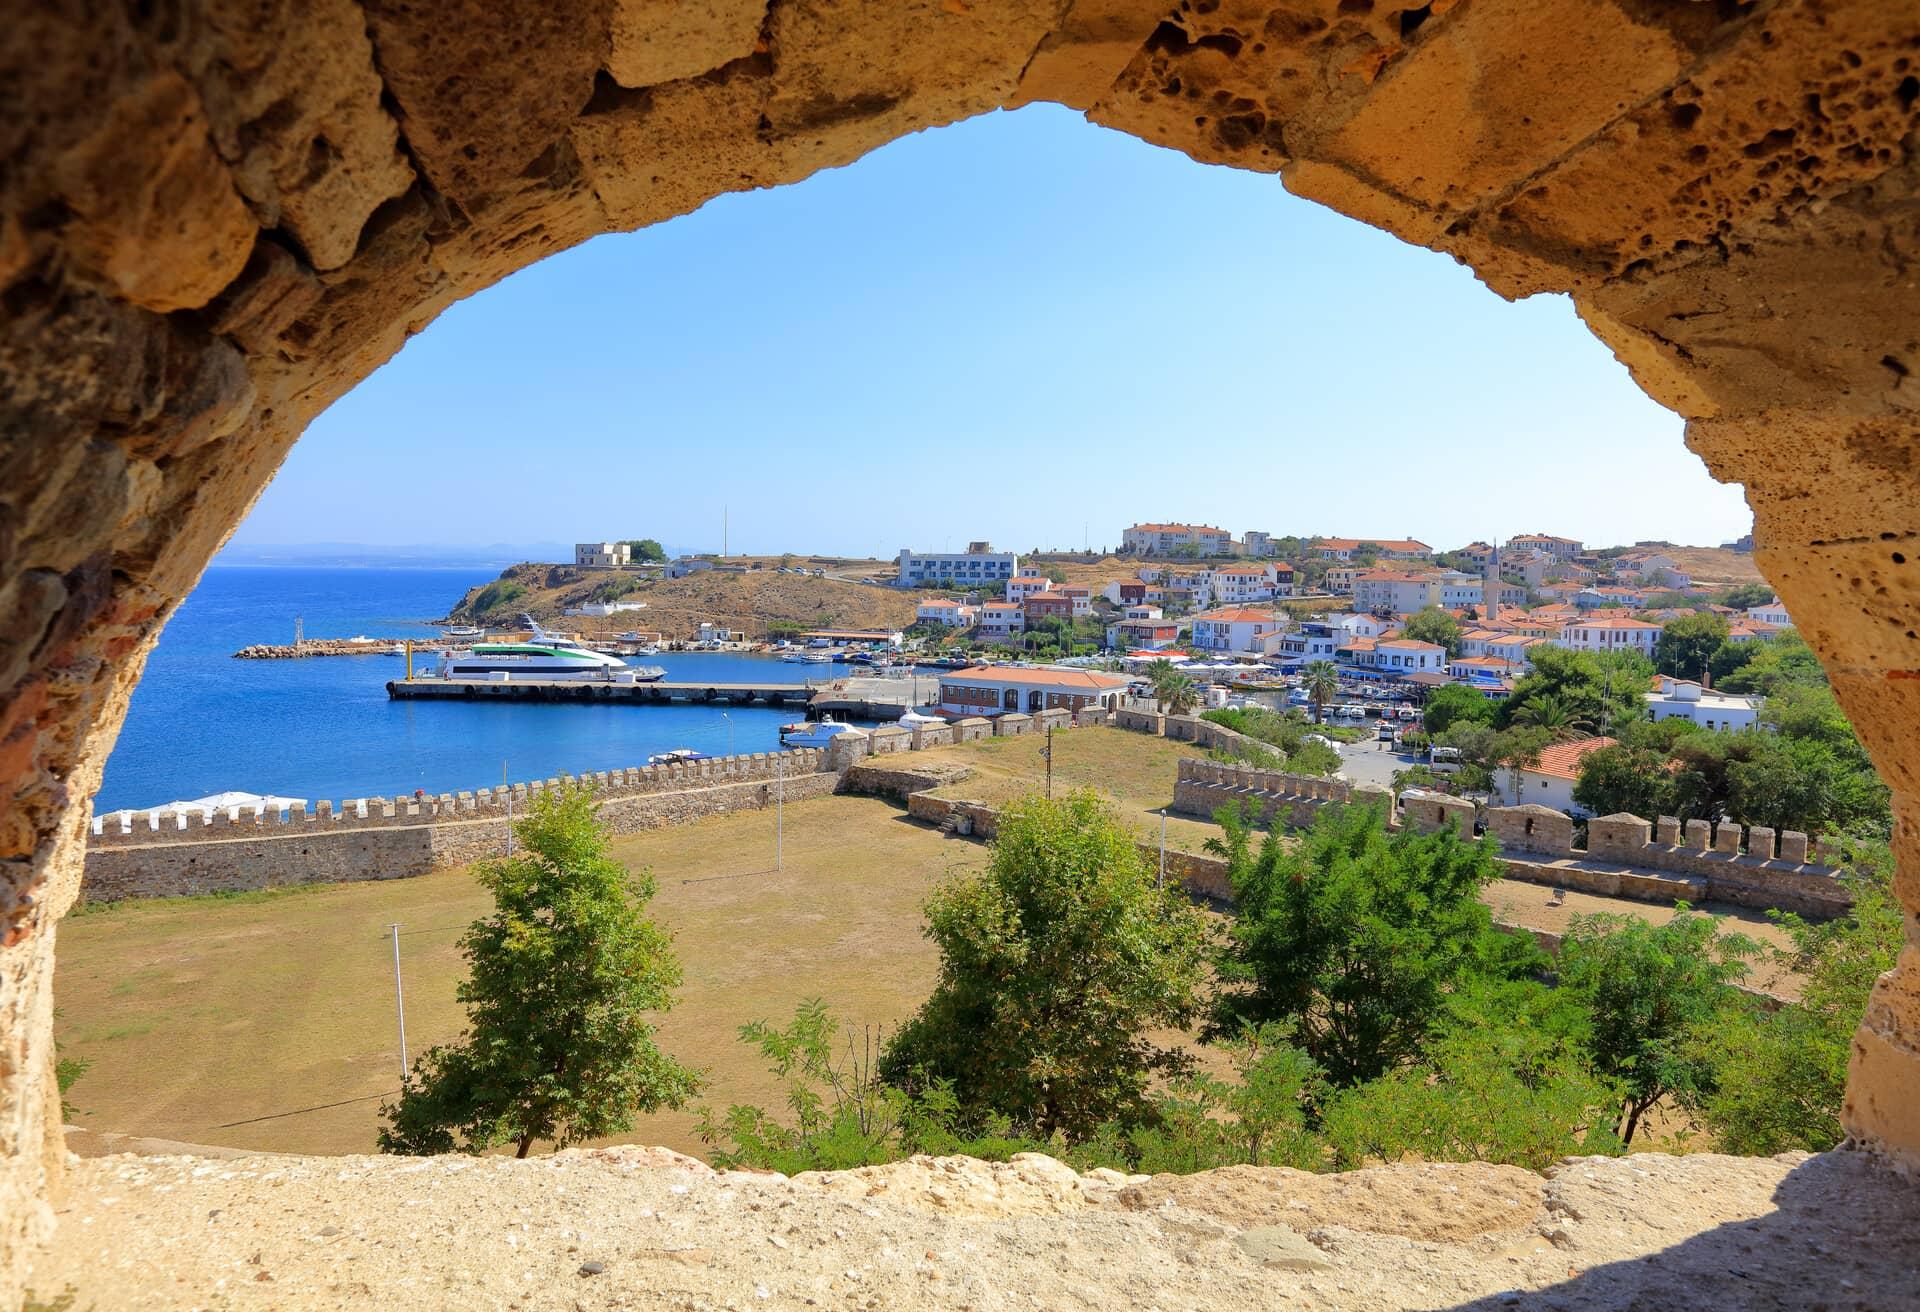 A view from Tenedo castle on Bozcaasa island, Turkey.